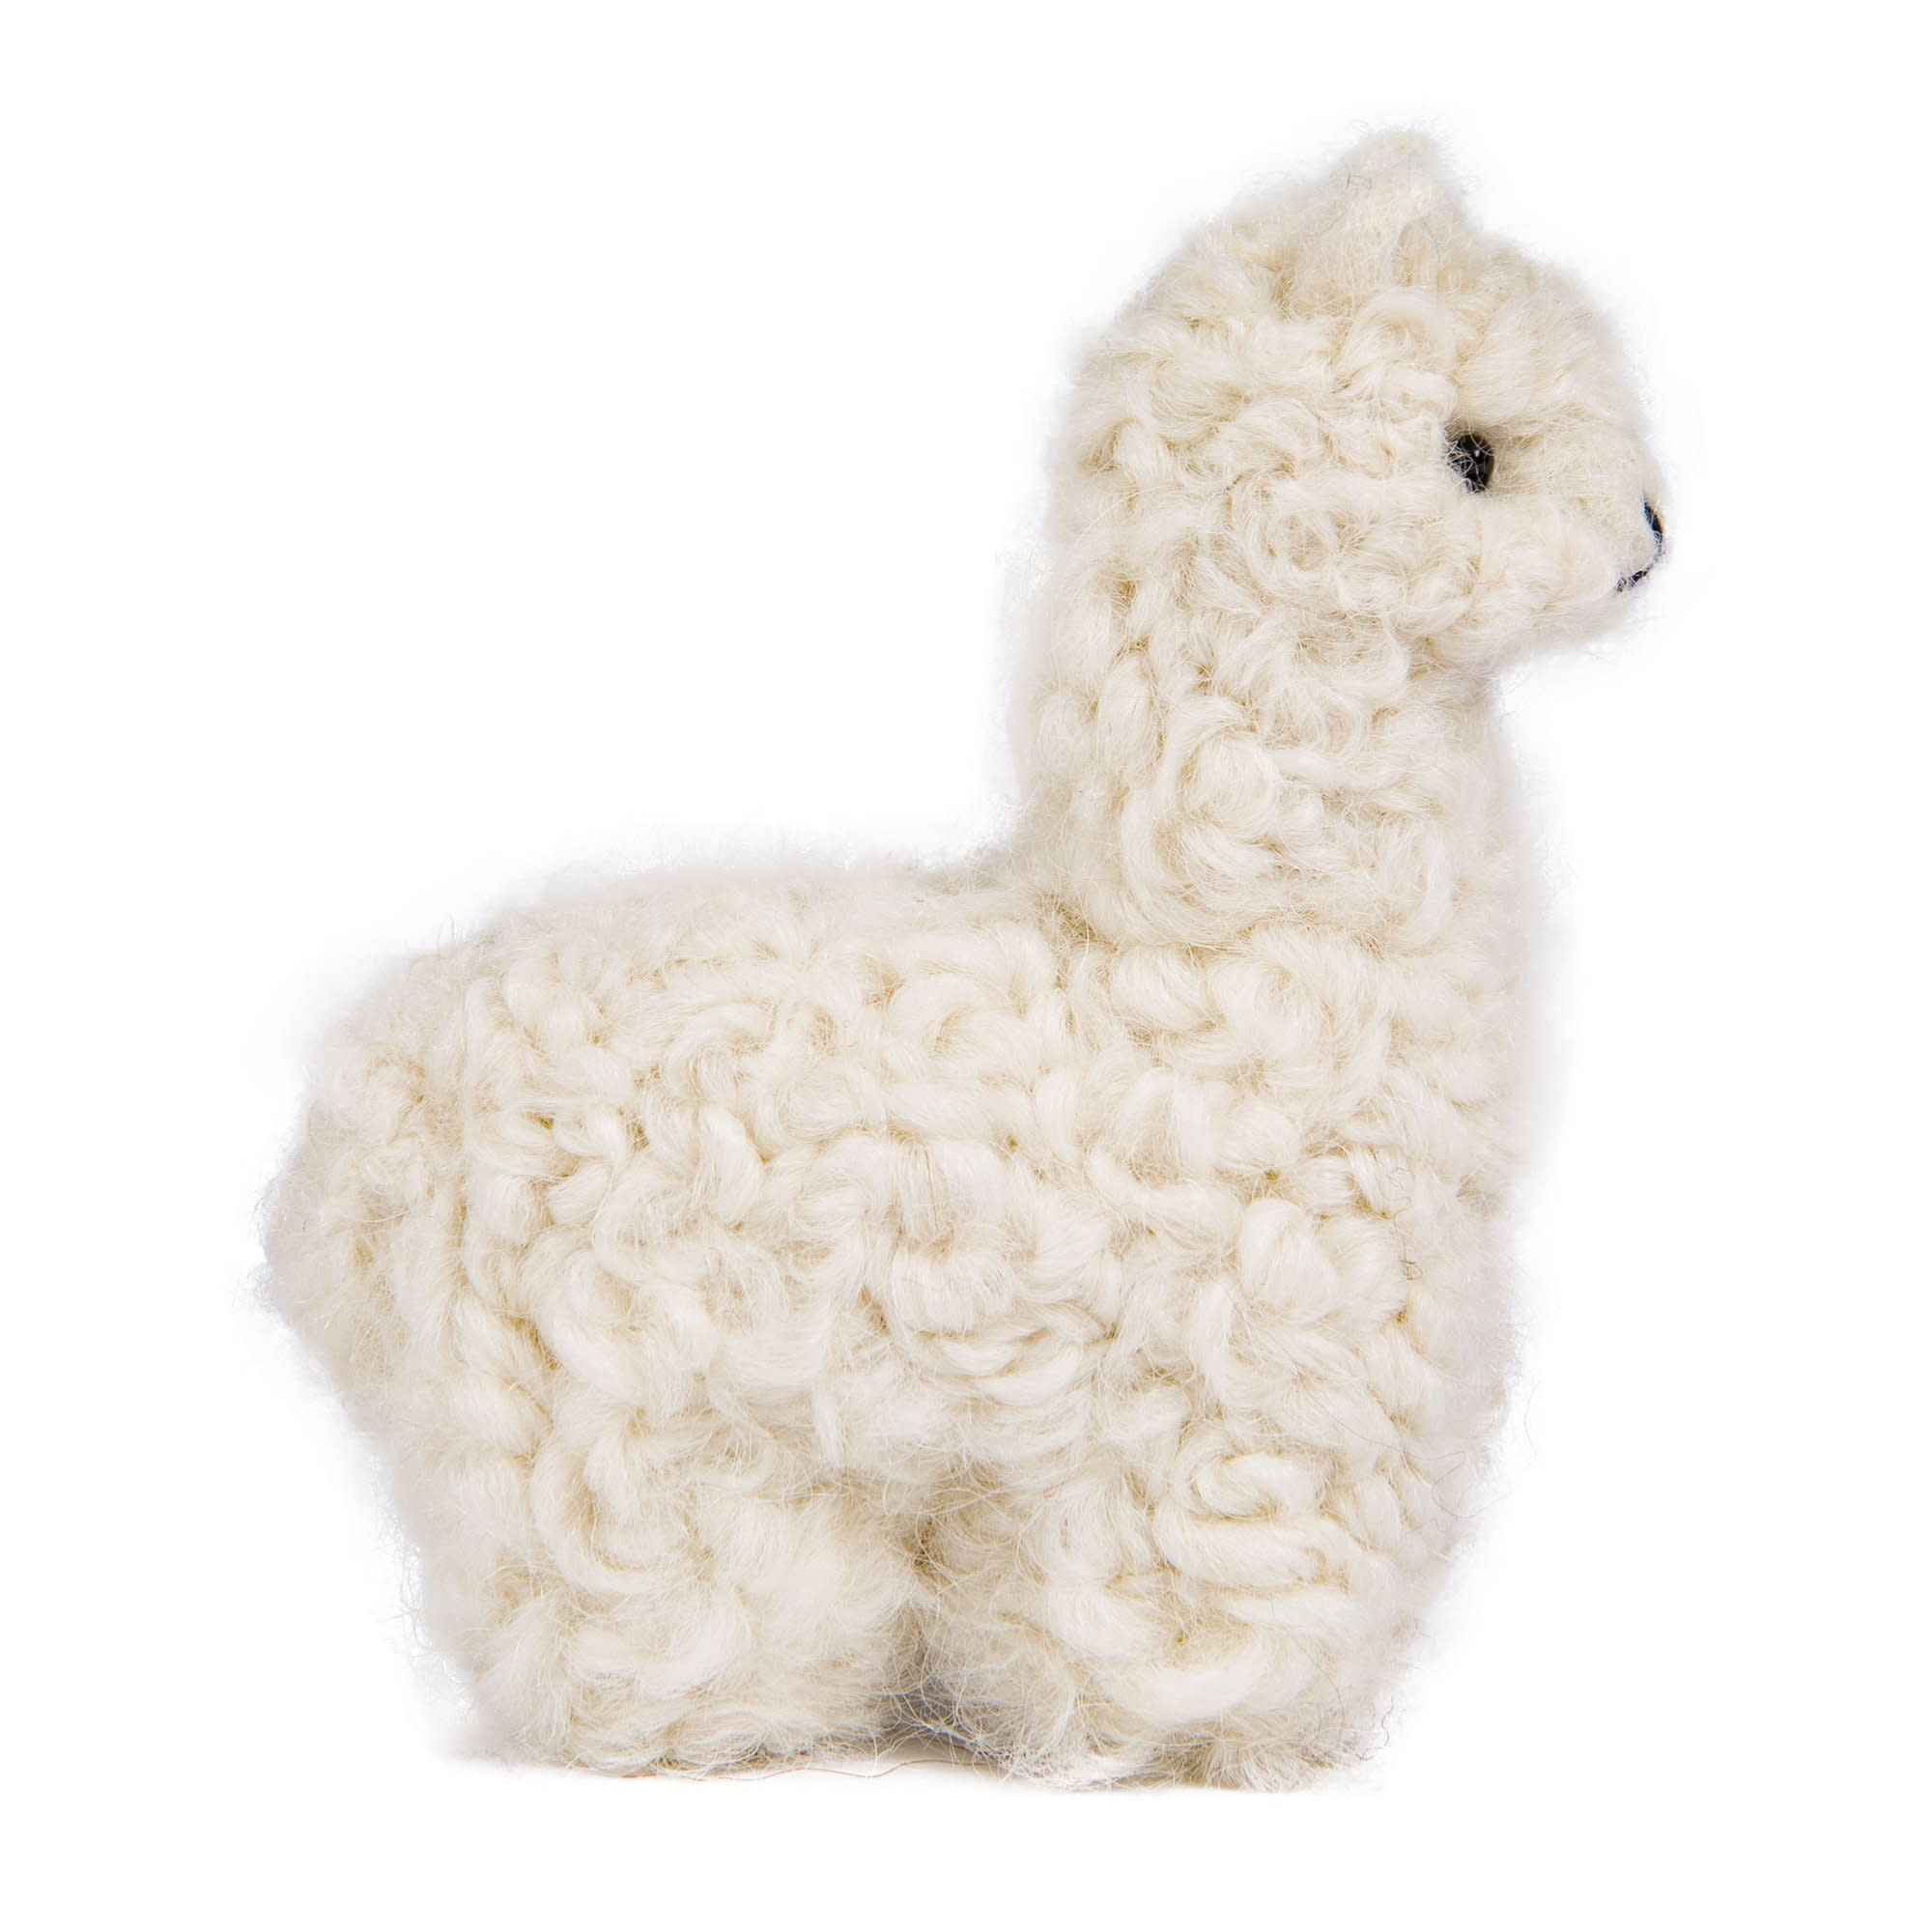 "Pokoloko Needle Felted Alpaca 3.5"" White"